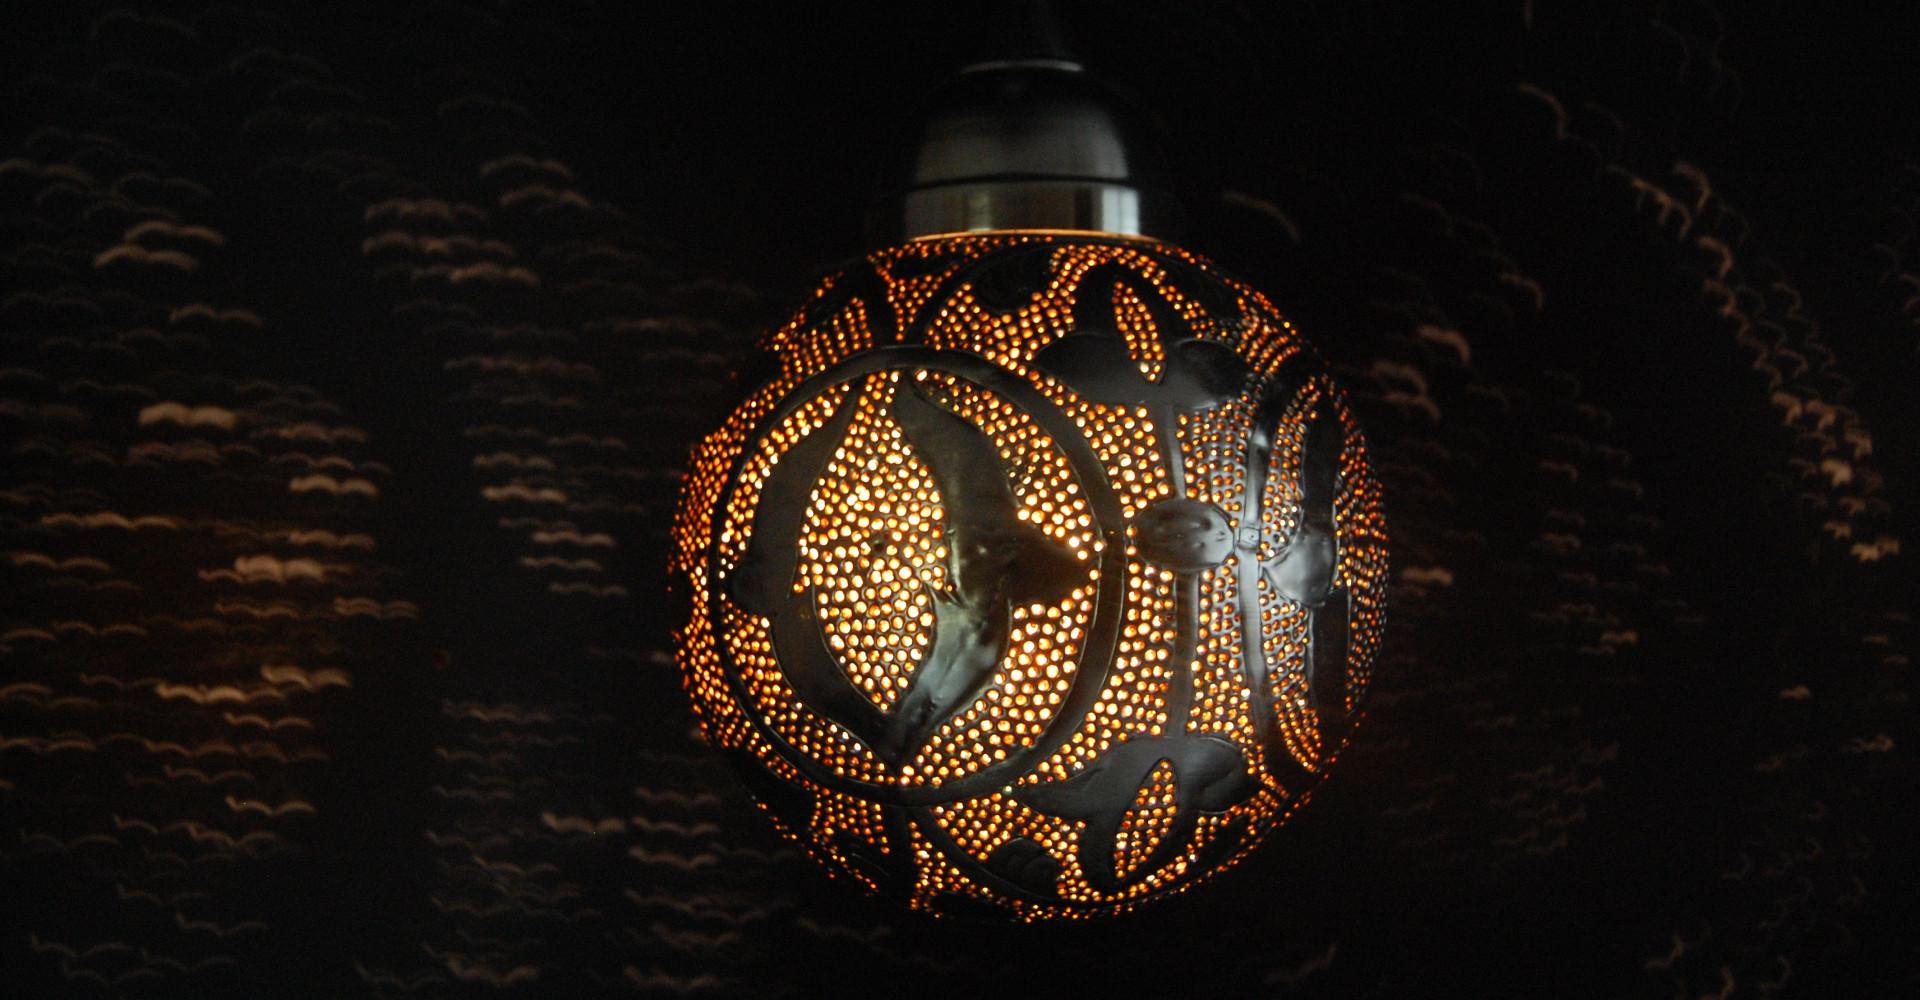 Marokkaanse Lampen Huis : Gekleurde oosterse lampen sfeer en living